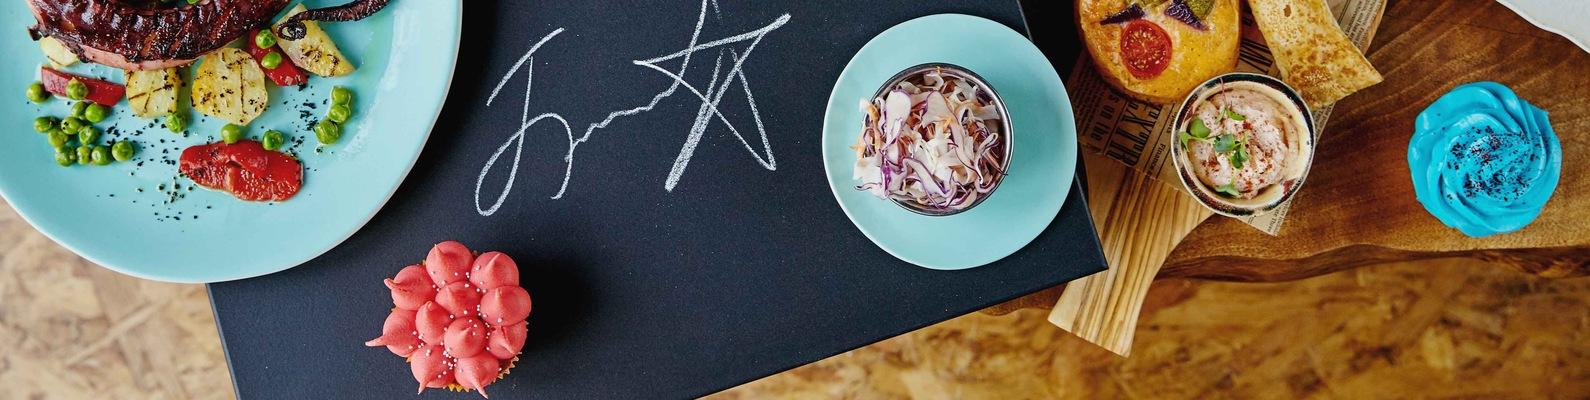 Рецепт александра бельковича теплый салат